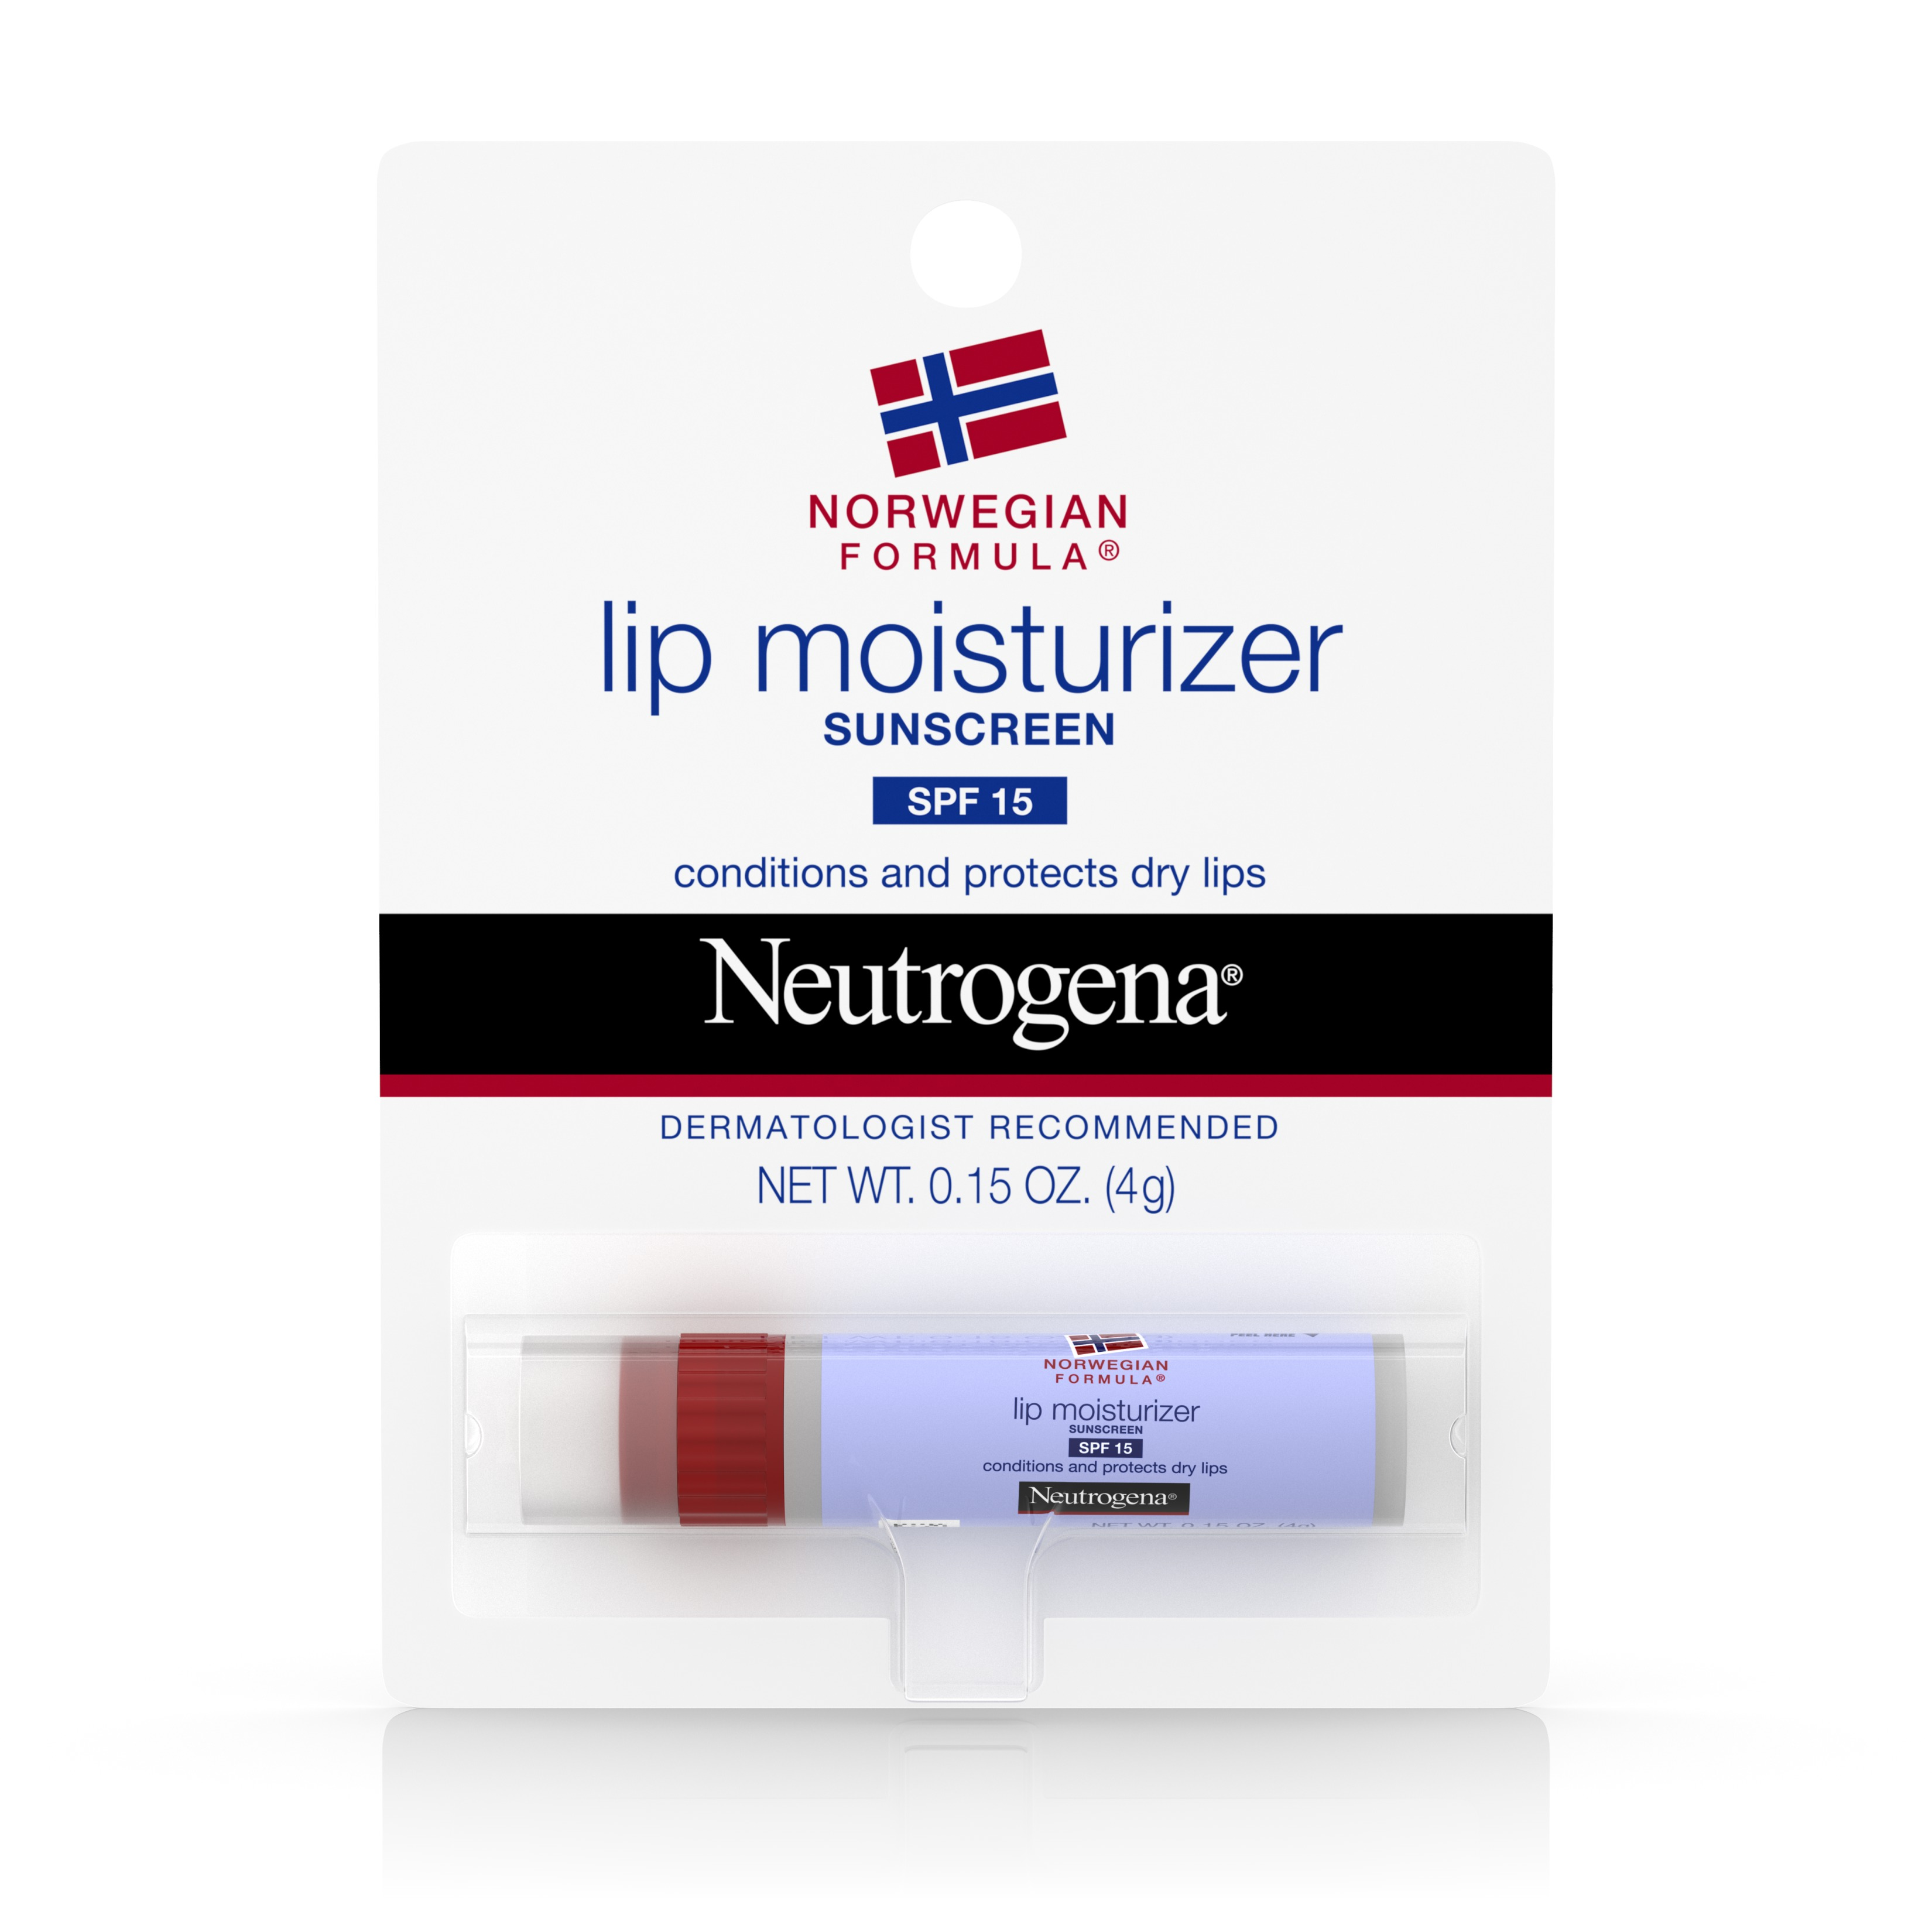 Neutrogena Norwegian Formula Lip Moisturizer With Sunscreen, Spf 15, .15 Oz. - Walmart.com